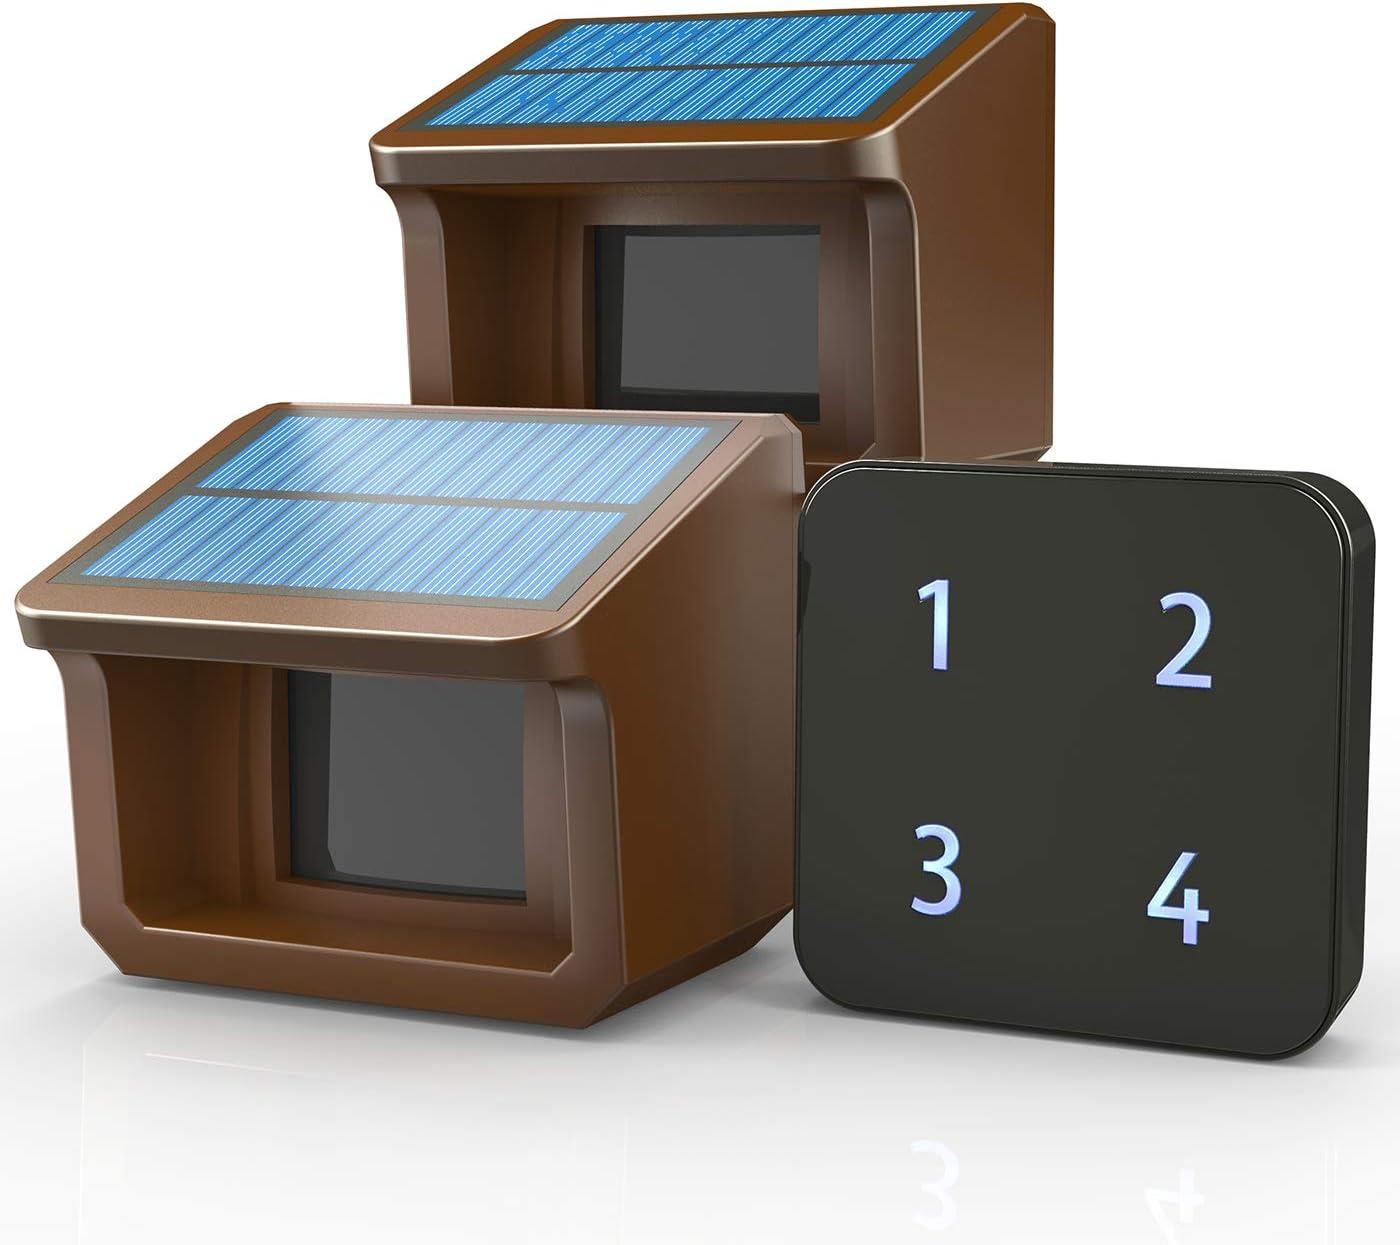 1/2Mile Solar Driveway Alarm System-Up to 70FT Wide Sensor Range 3 Adjustable Sensitivities-Fully Weatherproof Outdoor Motion Sensor&Detector DIY Security Alert System-1 Receiver and 2 Sensors KIT